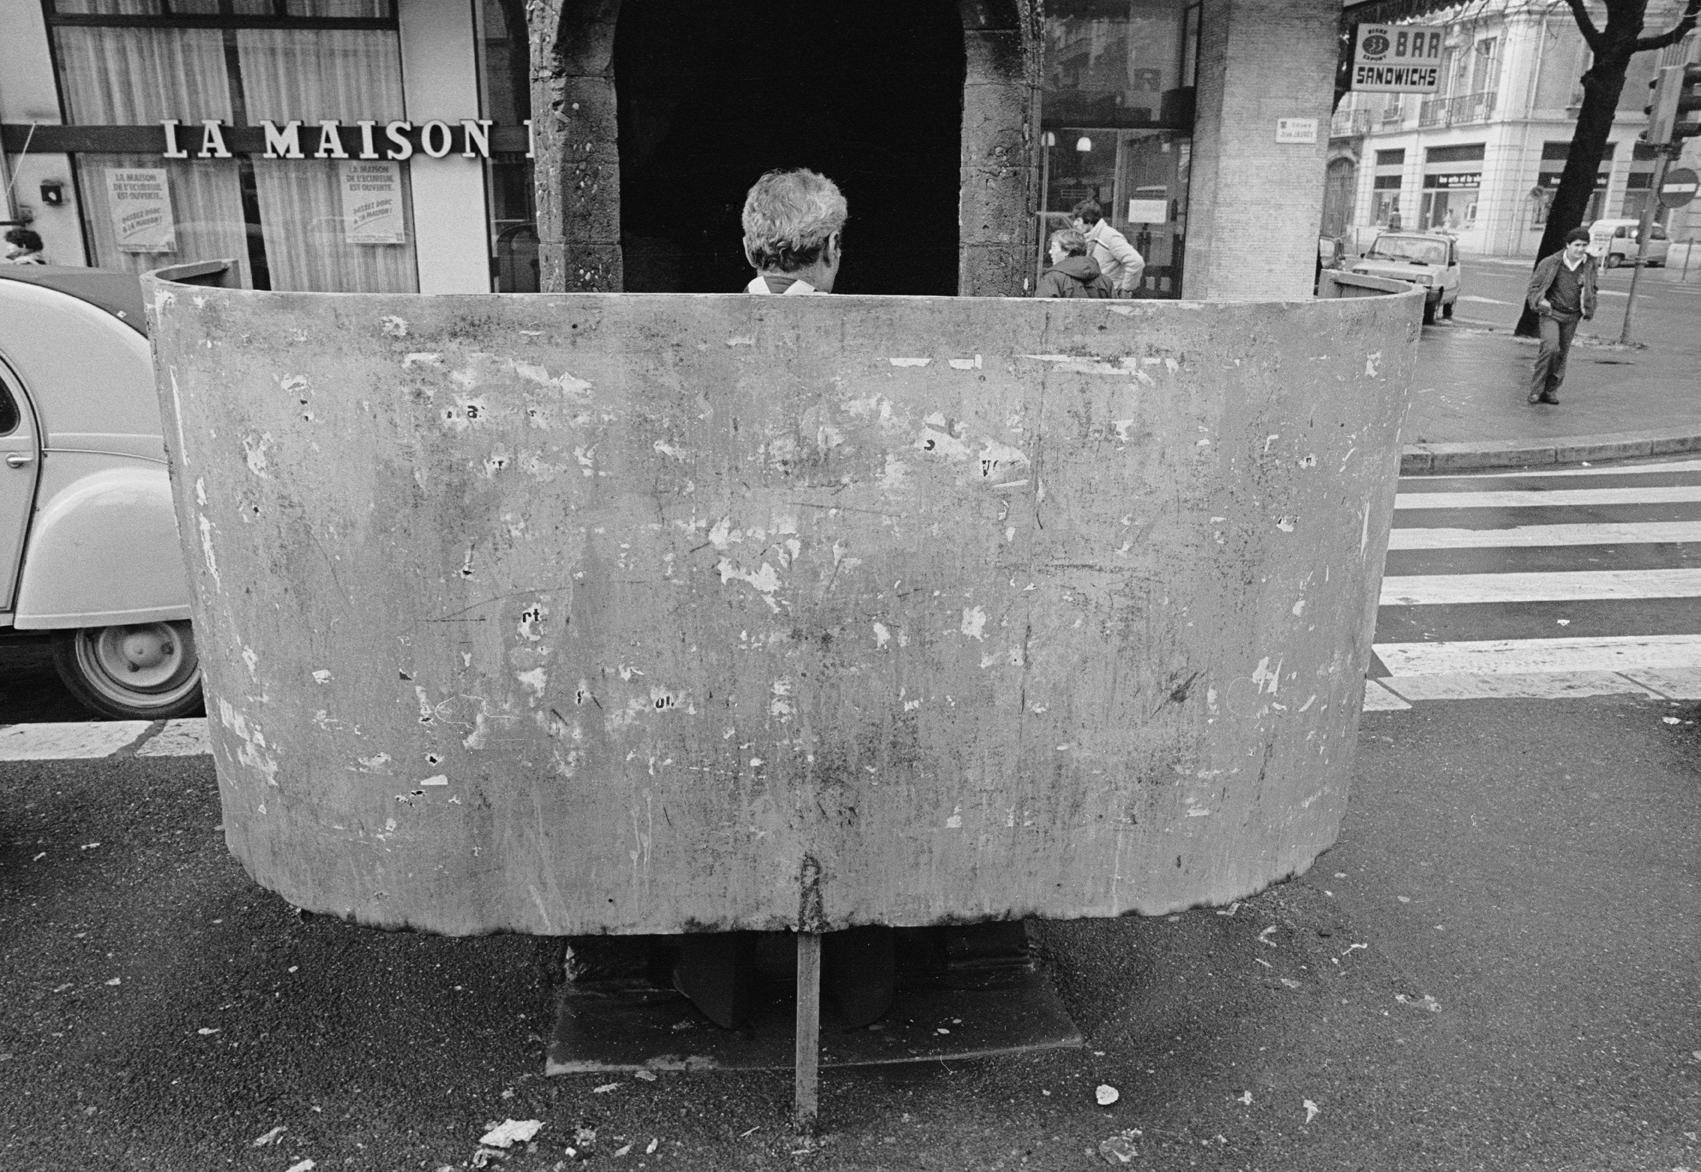 Vespasienne, France 1982